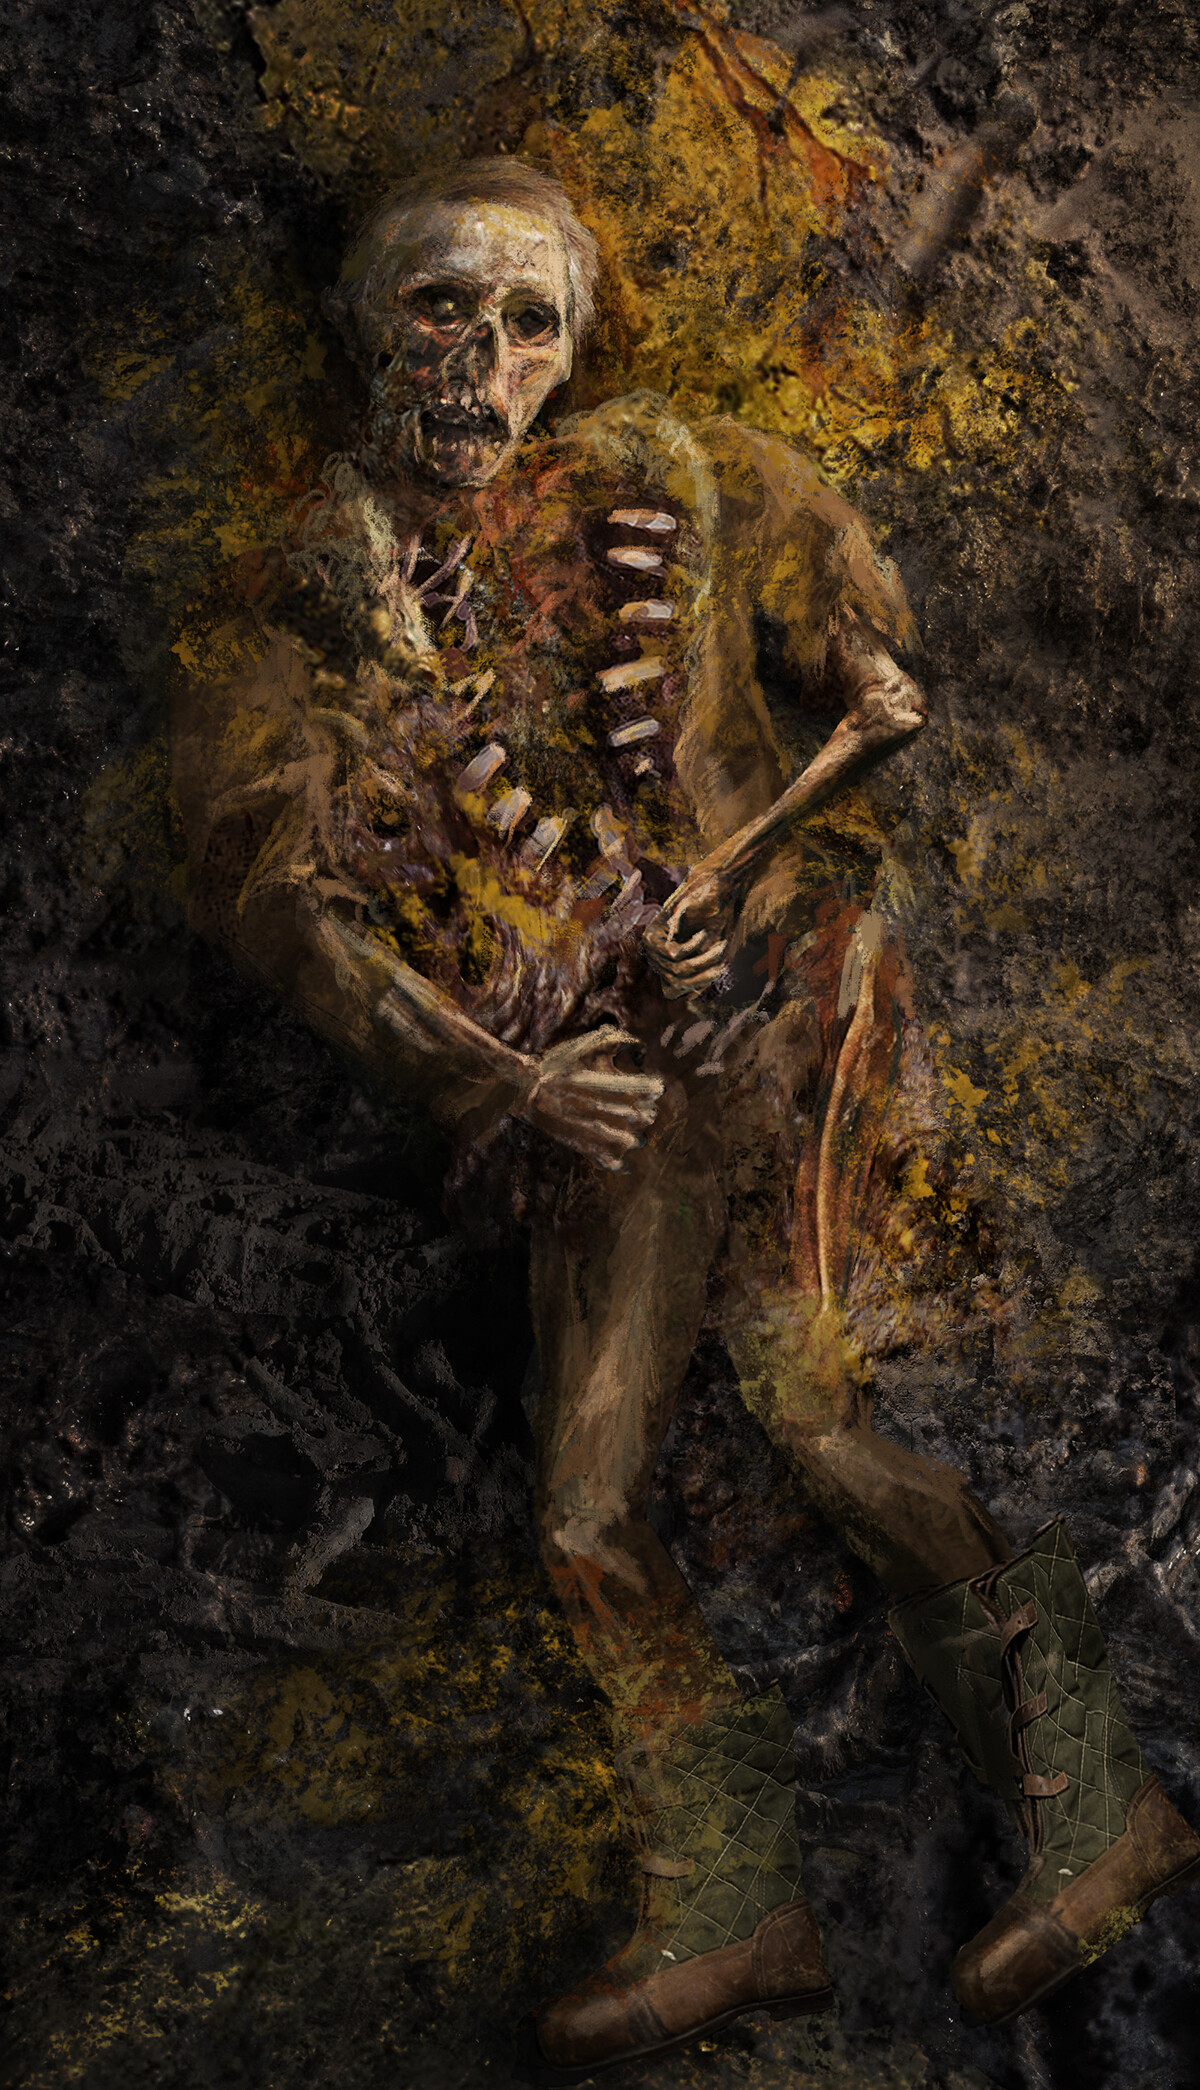 Eva kedves nest corpse concept 01 v01